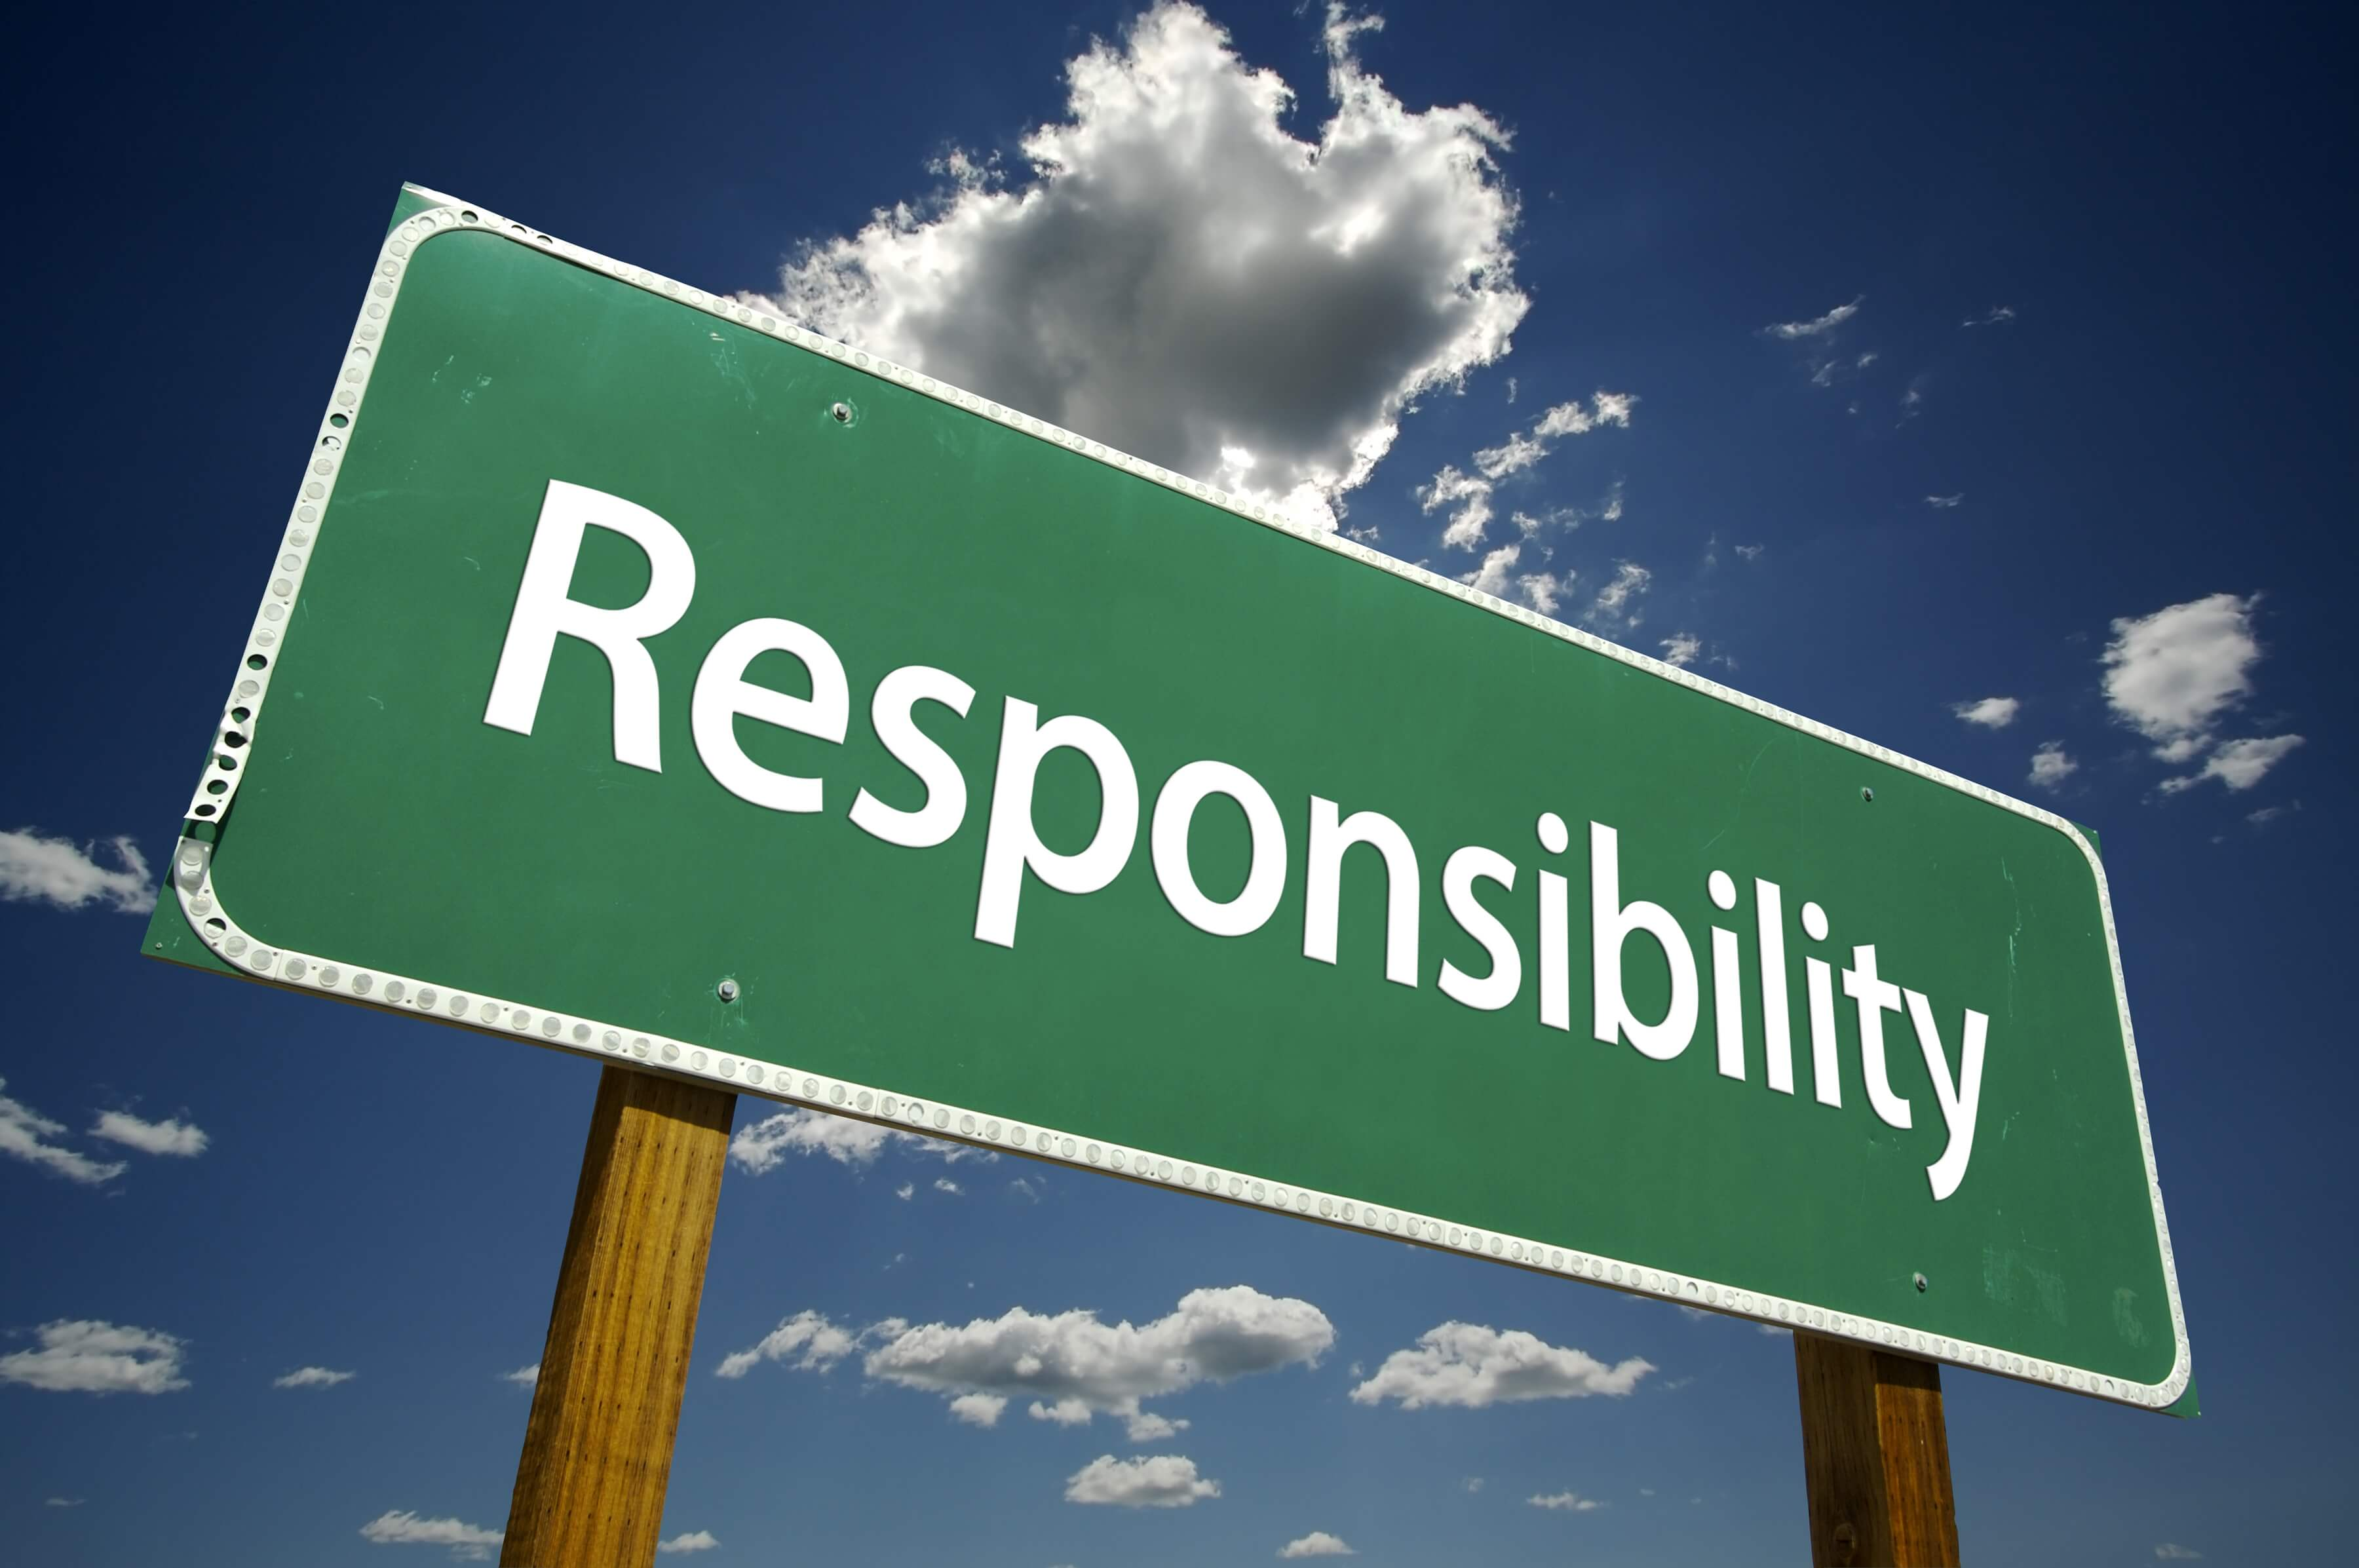 Responsibility billboard